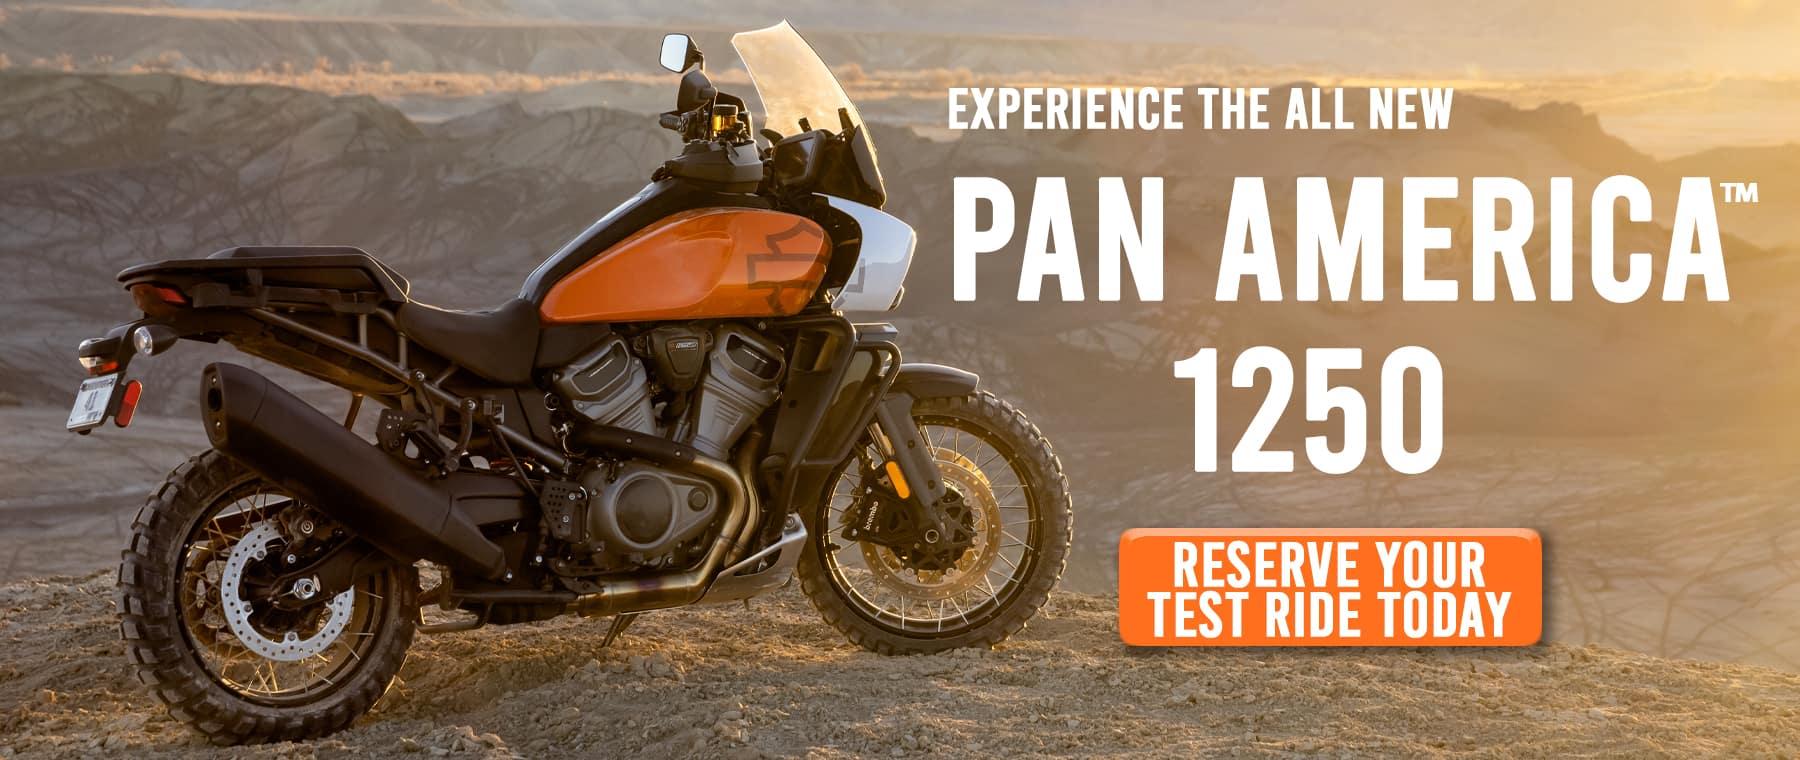 pan am test ride desktop